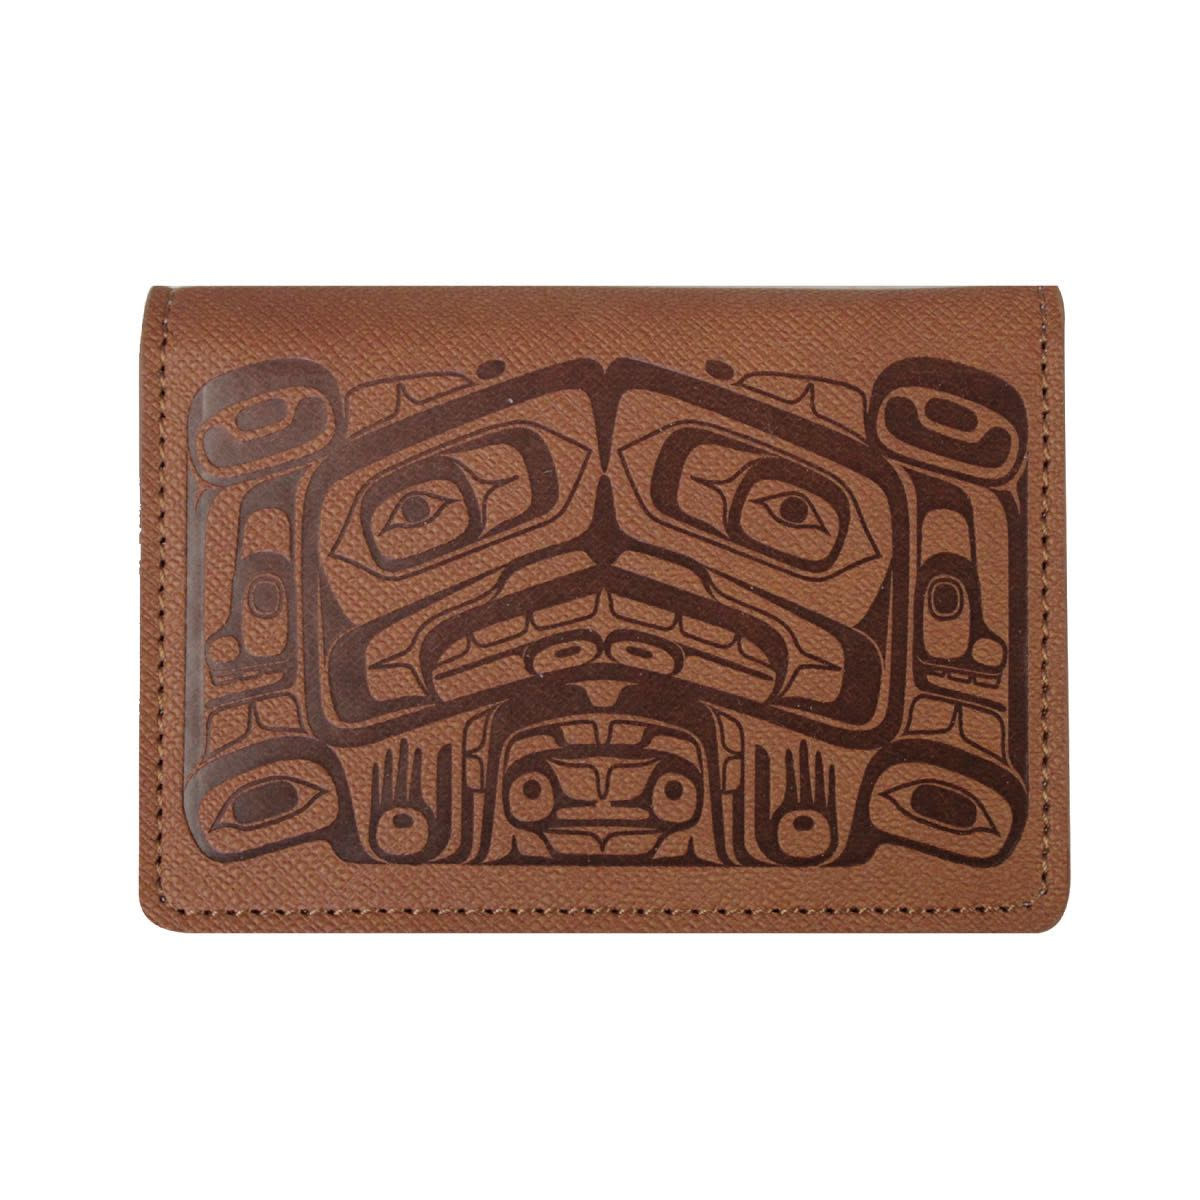 Card Wallet-Raven Box by Allan Weir-2